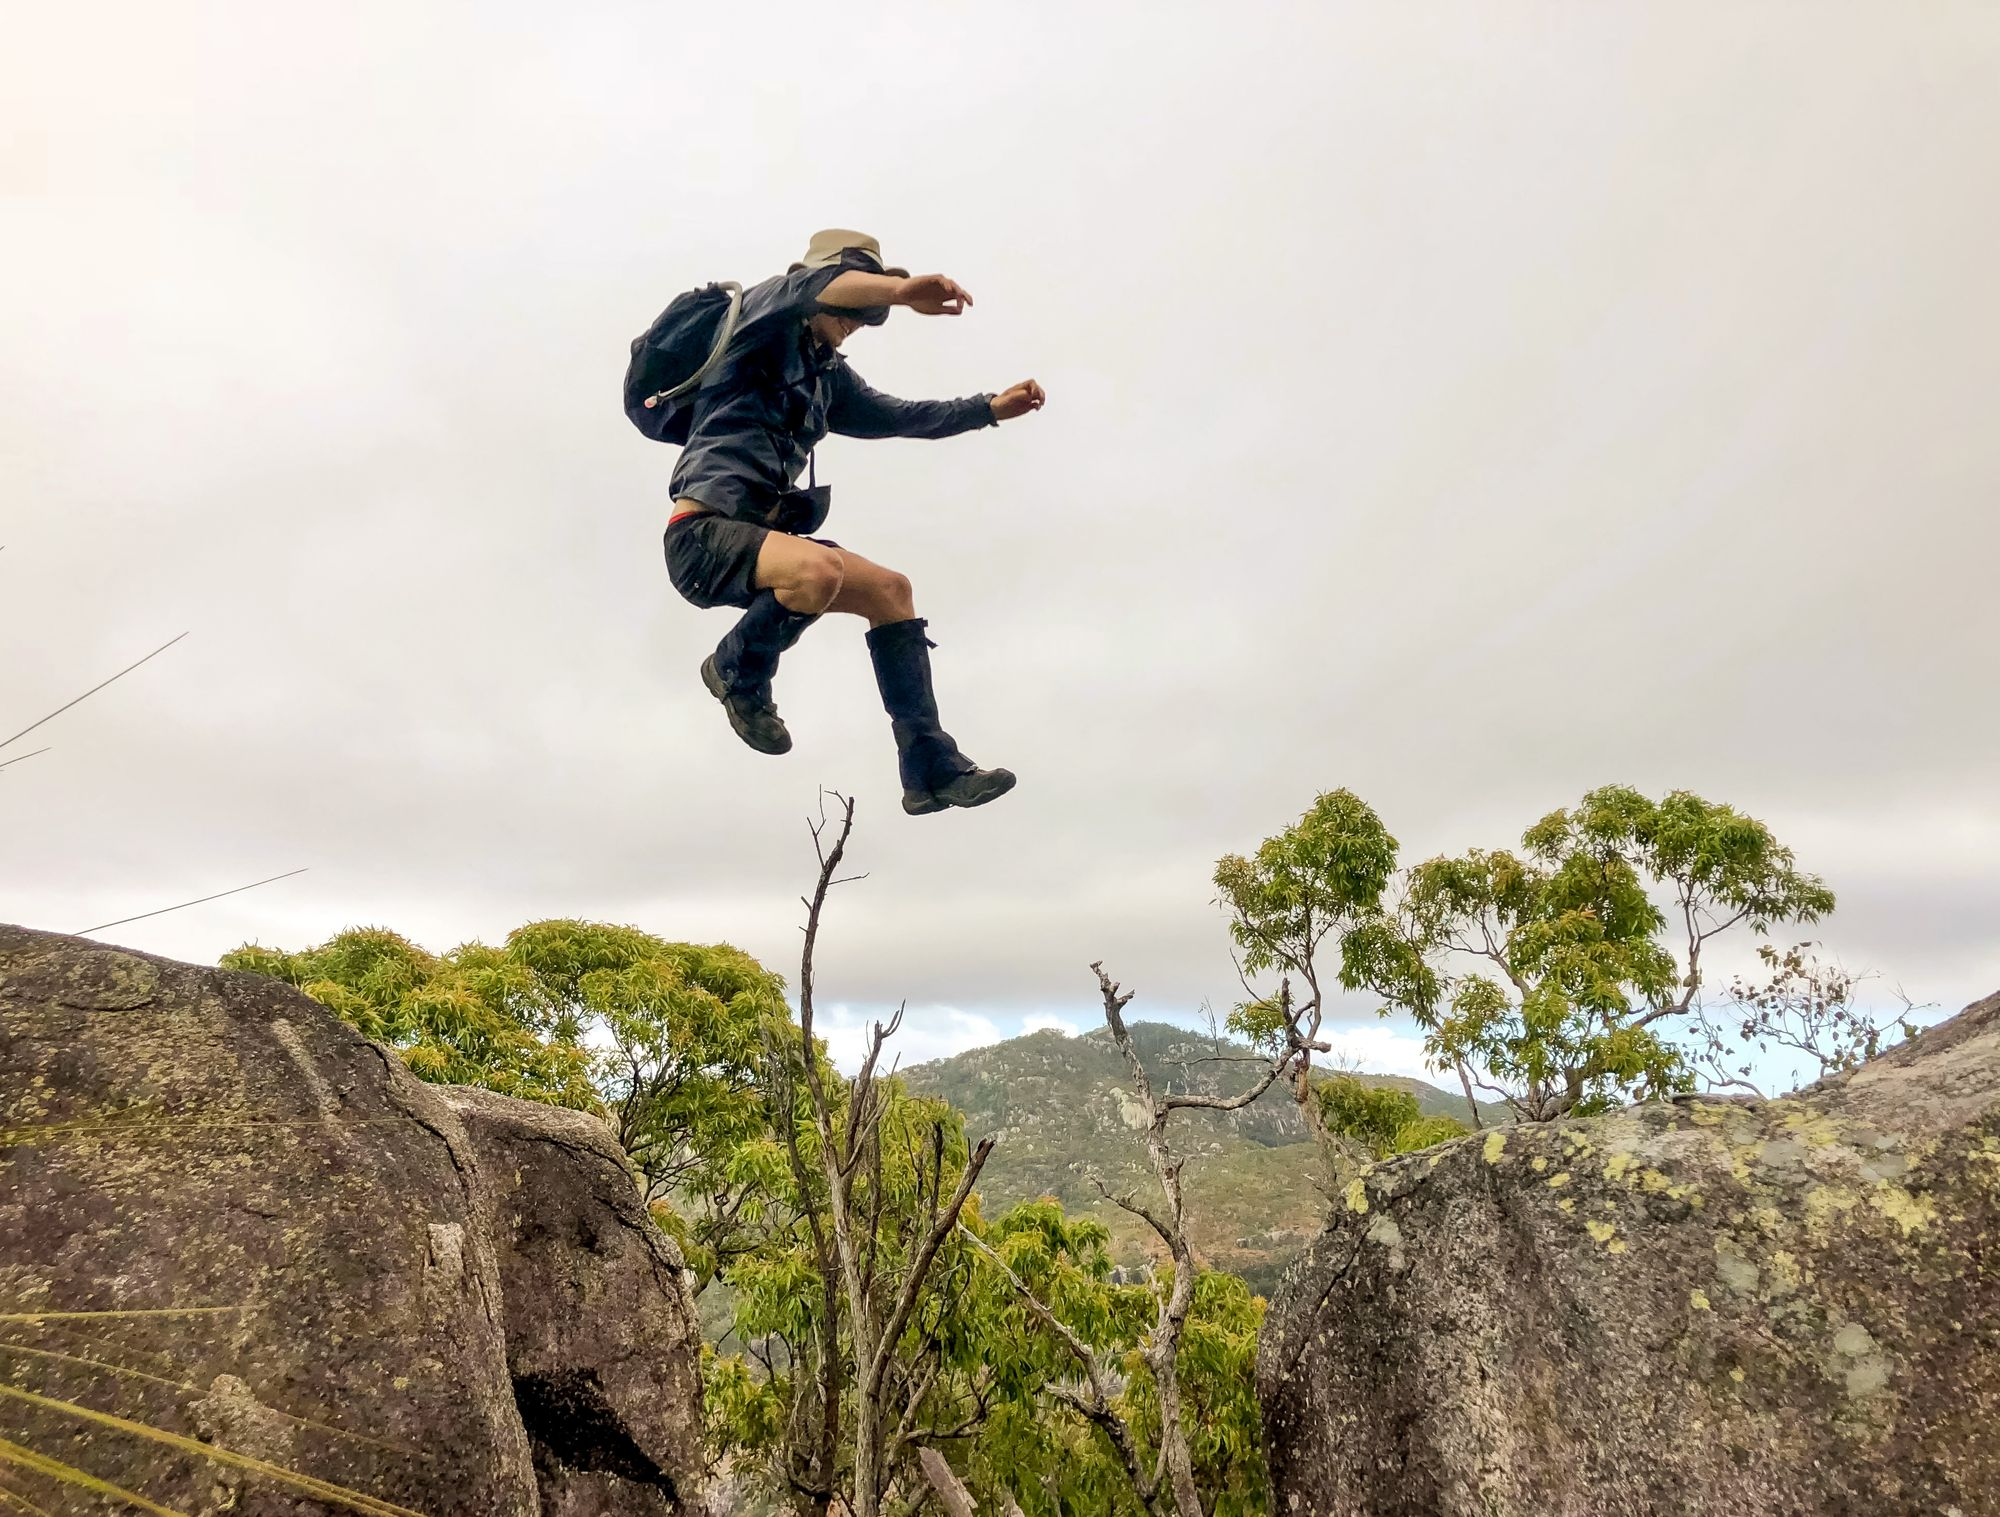 Luen Warneke Rock Jump